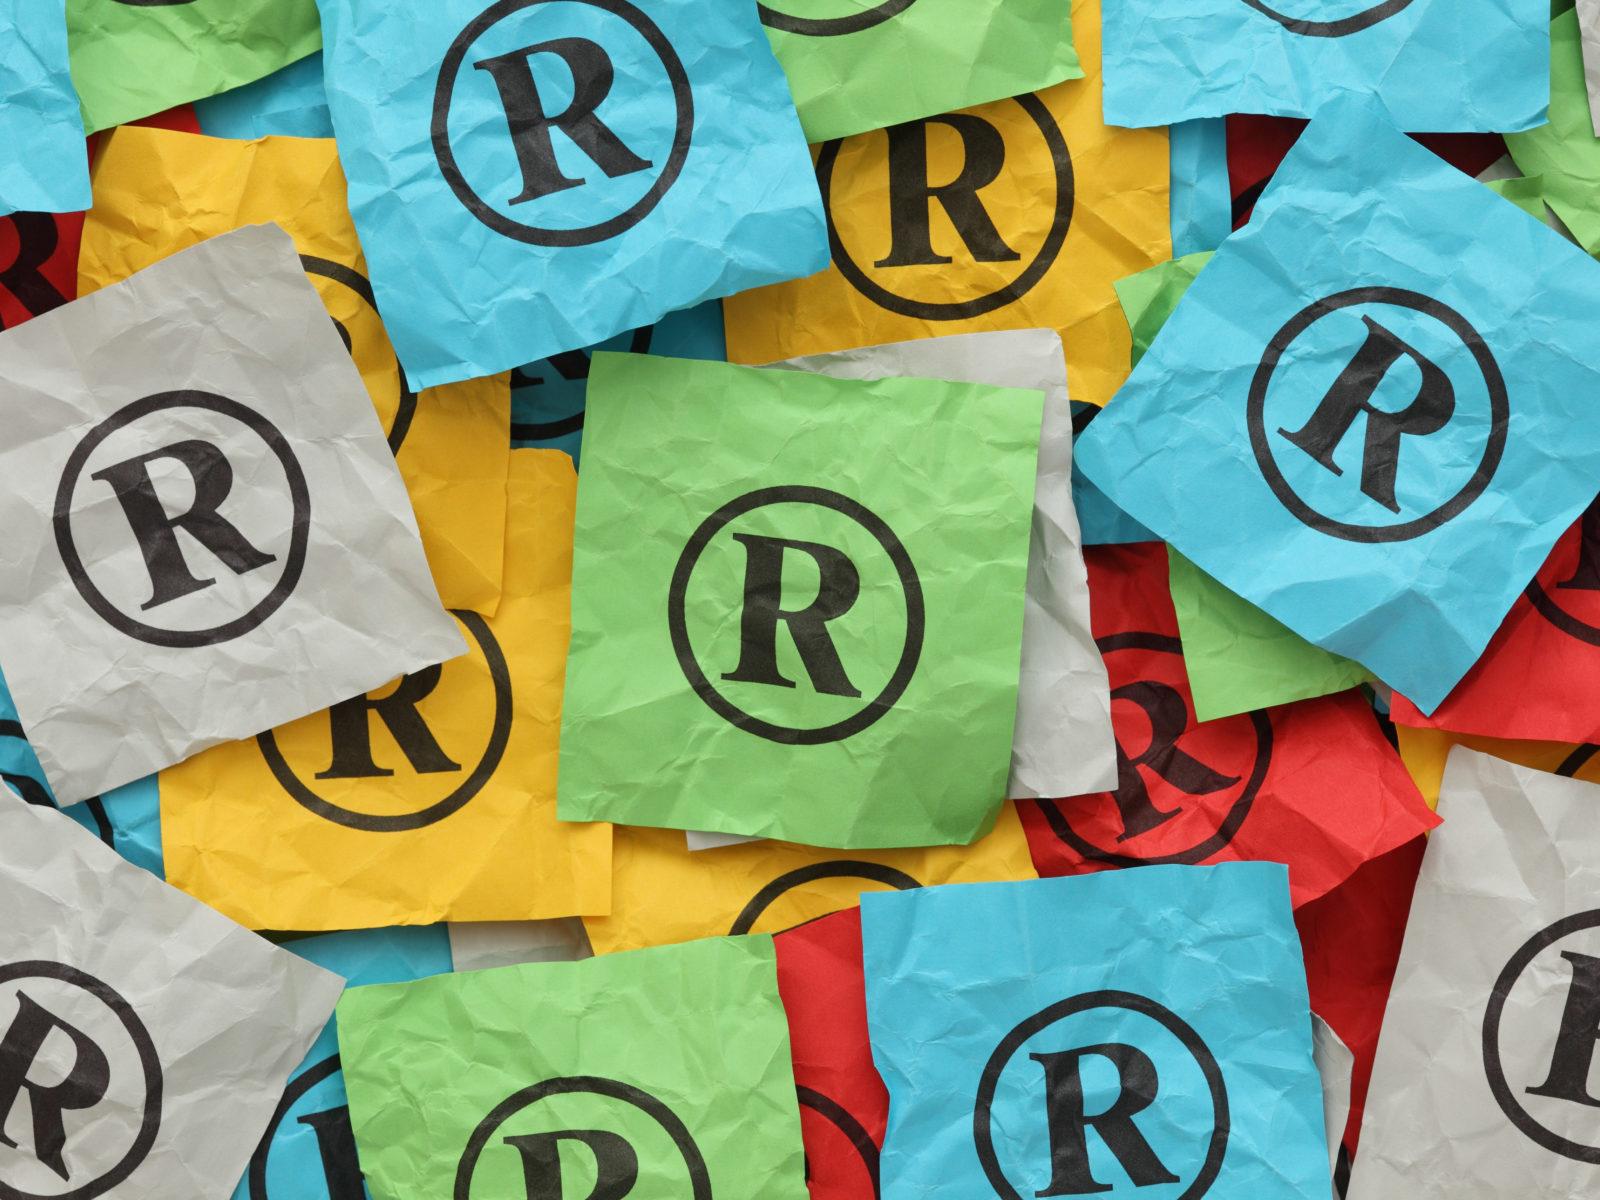 Registeredsymboloncoloredpaper